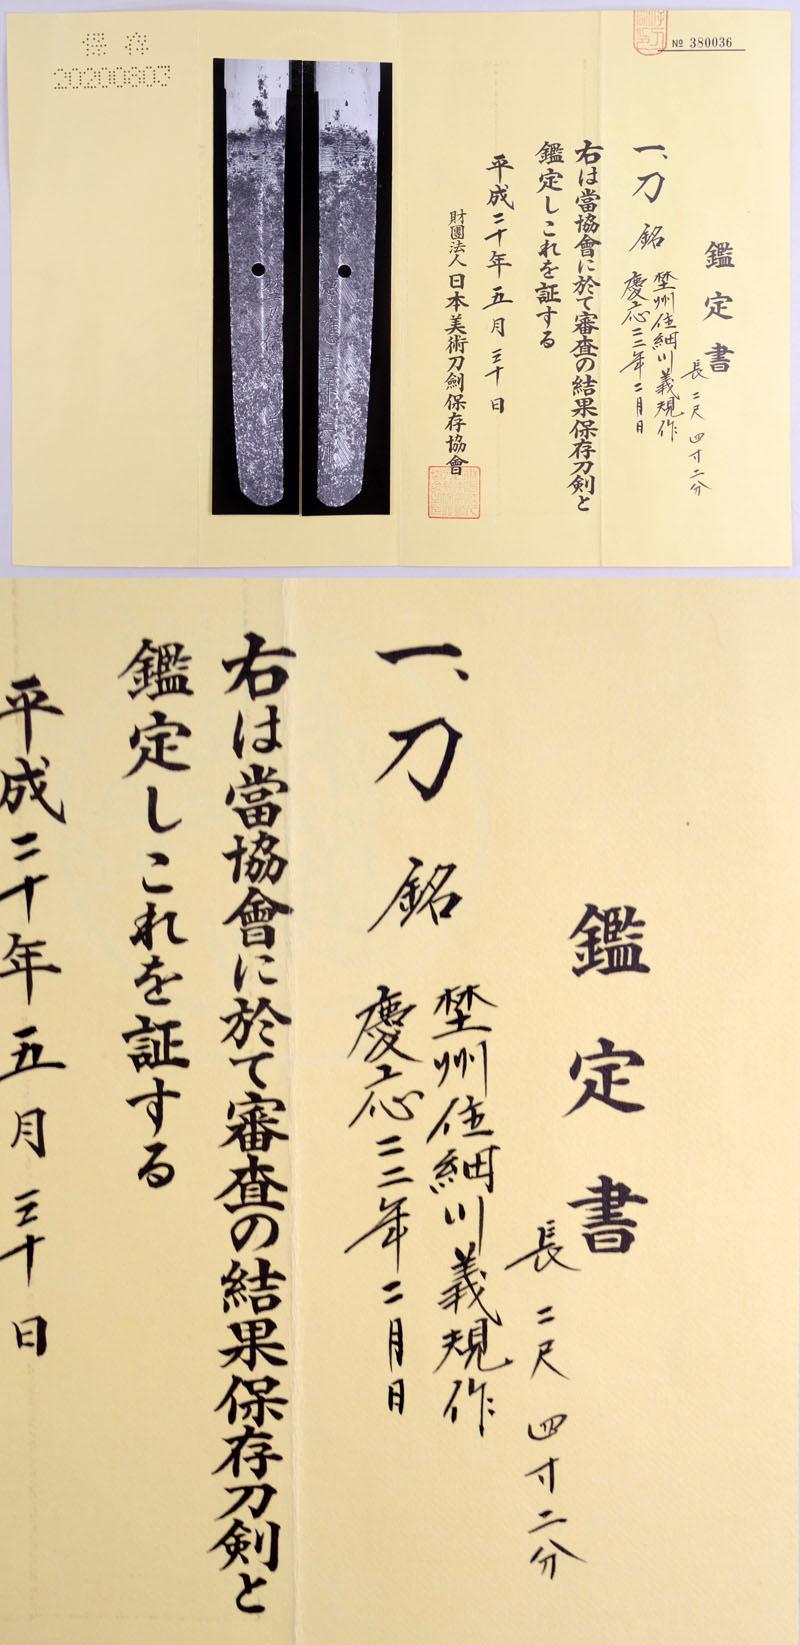 埜州住細川義規作 Picture of Certificate